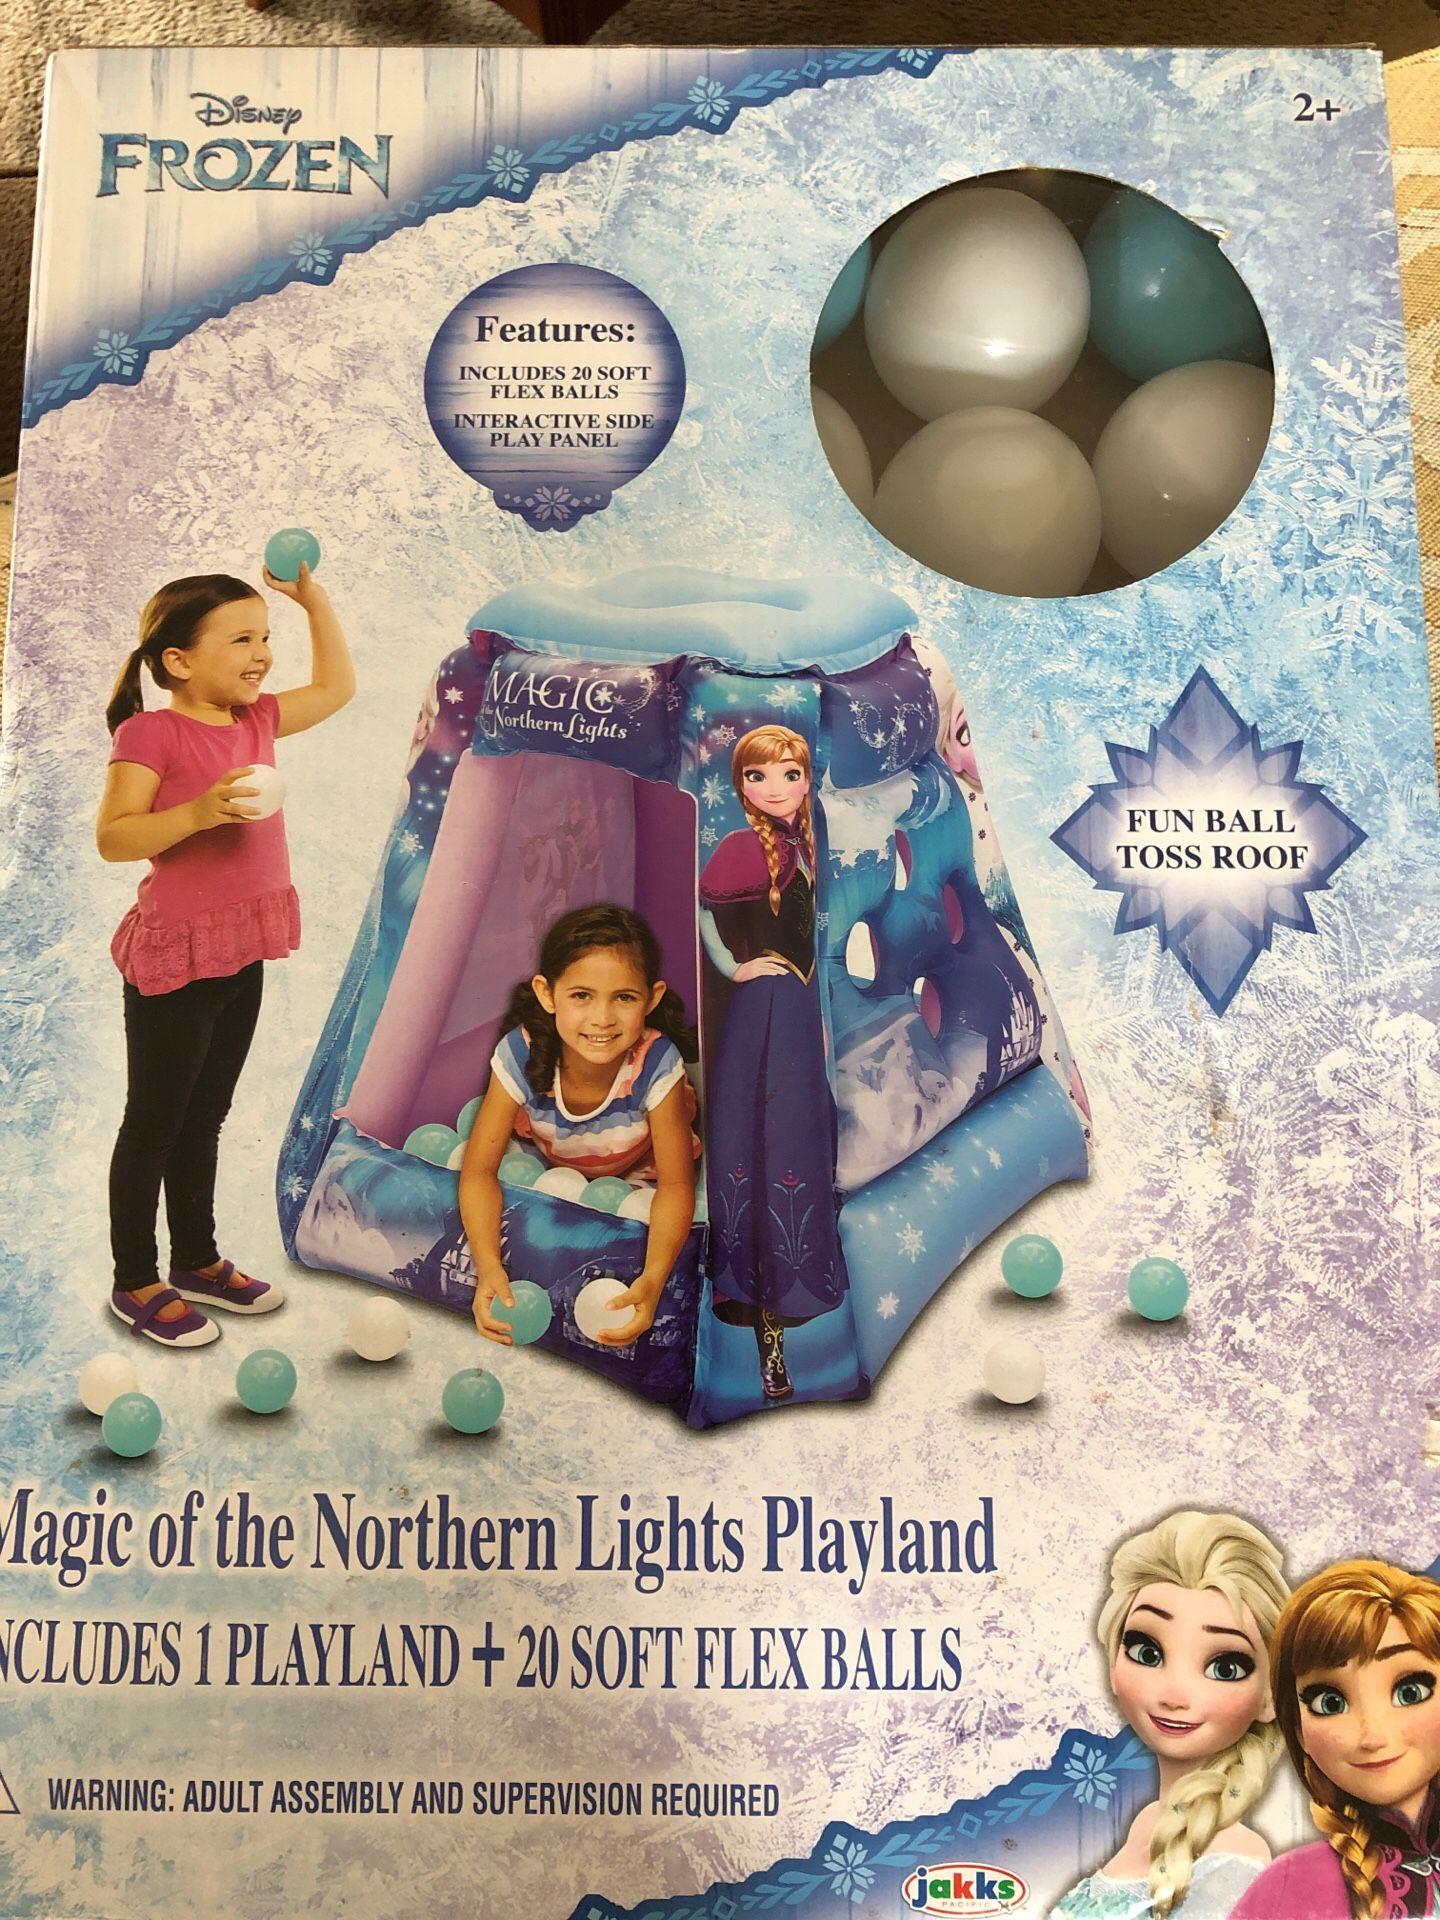 Frozen play land